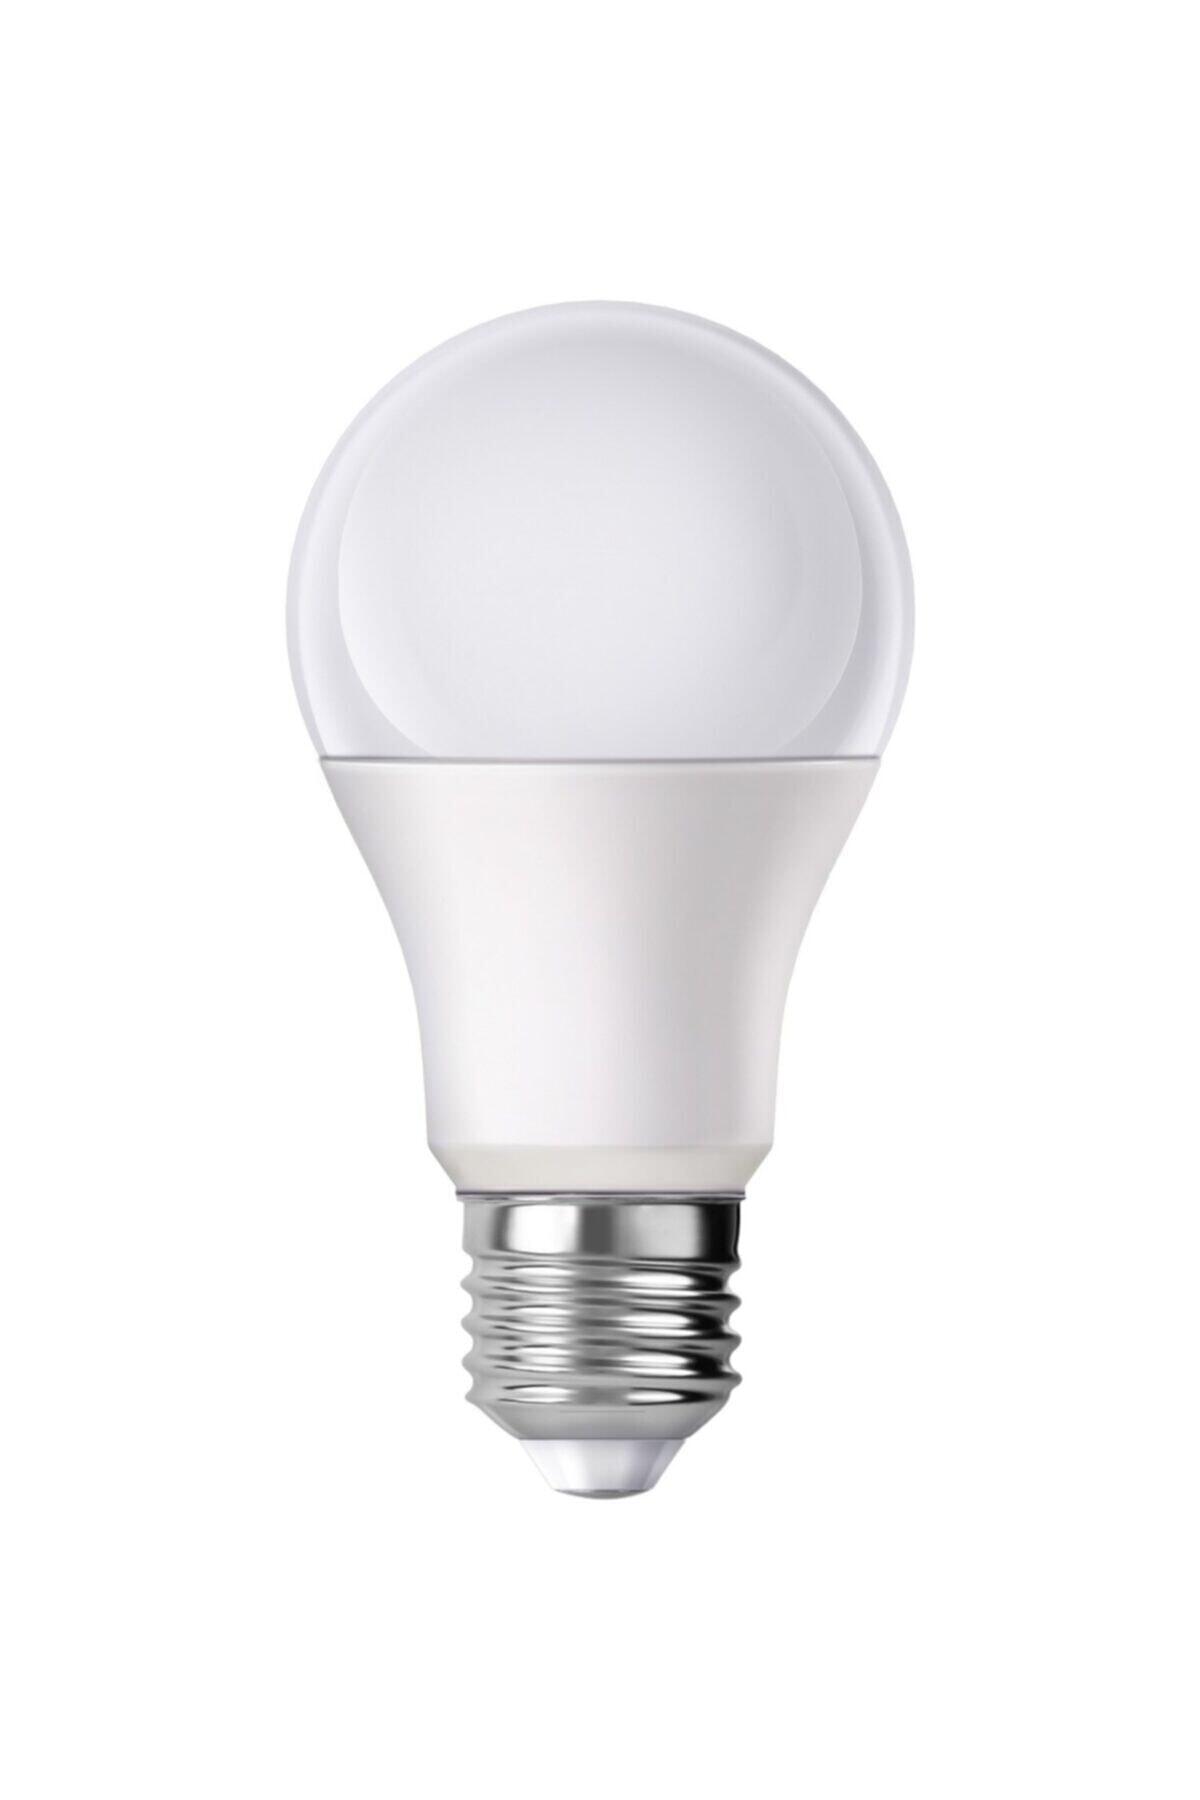 - 10w Led Ampul Beyaz Işık(6500K) E27 Duy